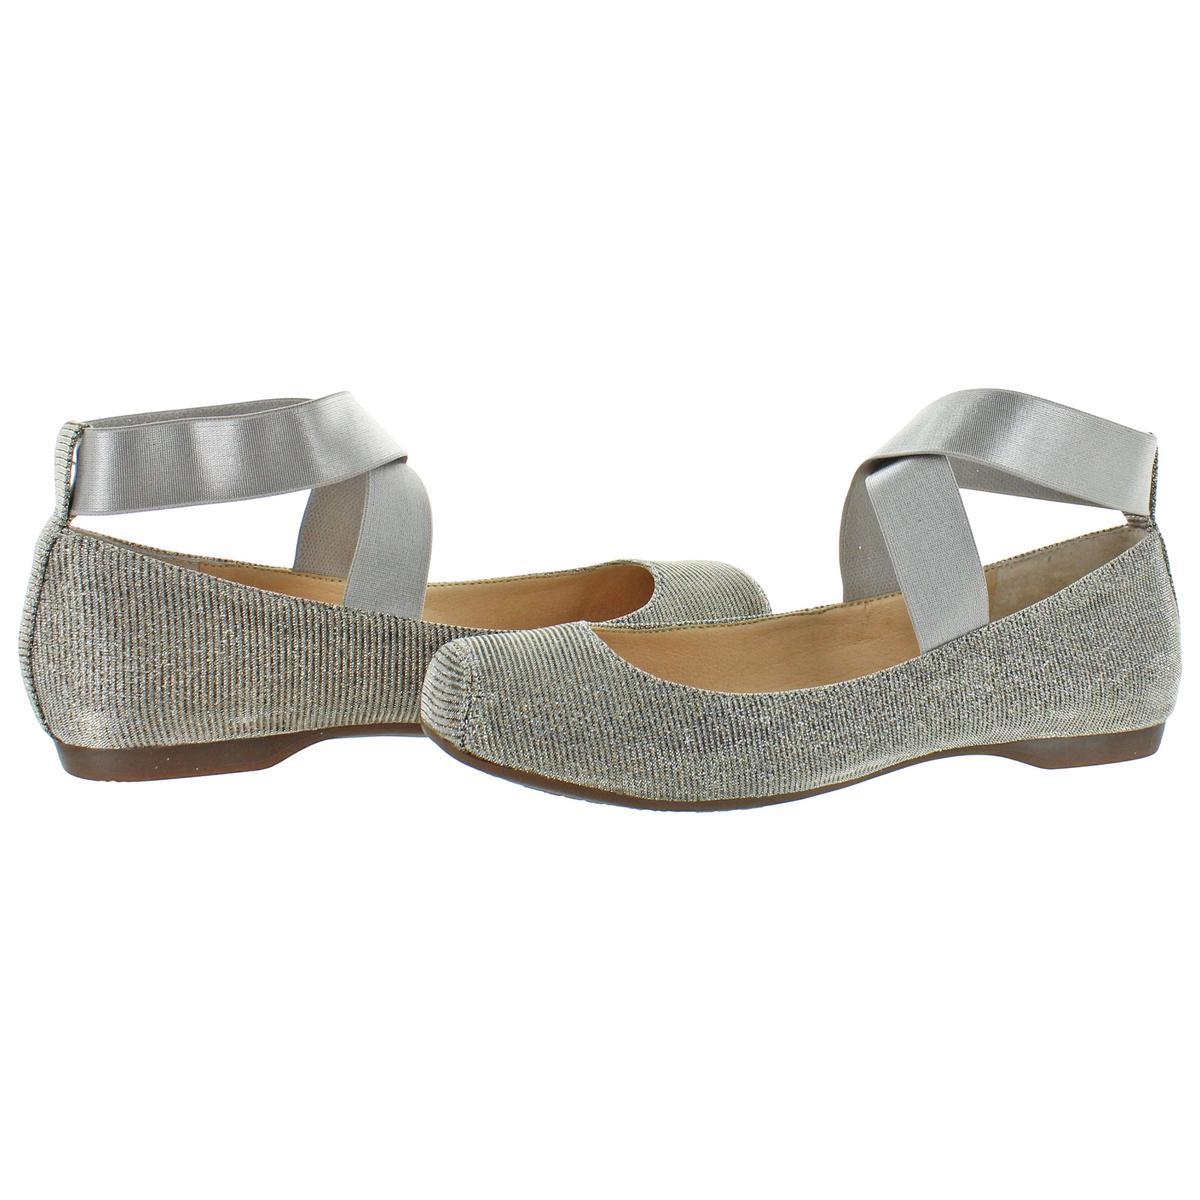 Jessica-Simpson-Women-039-s-Mandalaye-Square-Toe-Ankle-Wrap-Ballet-Flats thumbnail 7